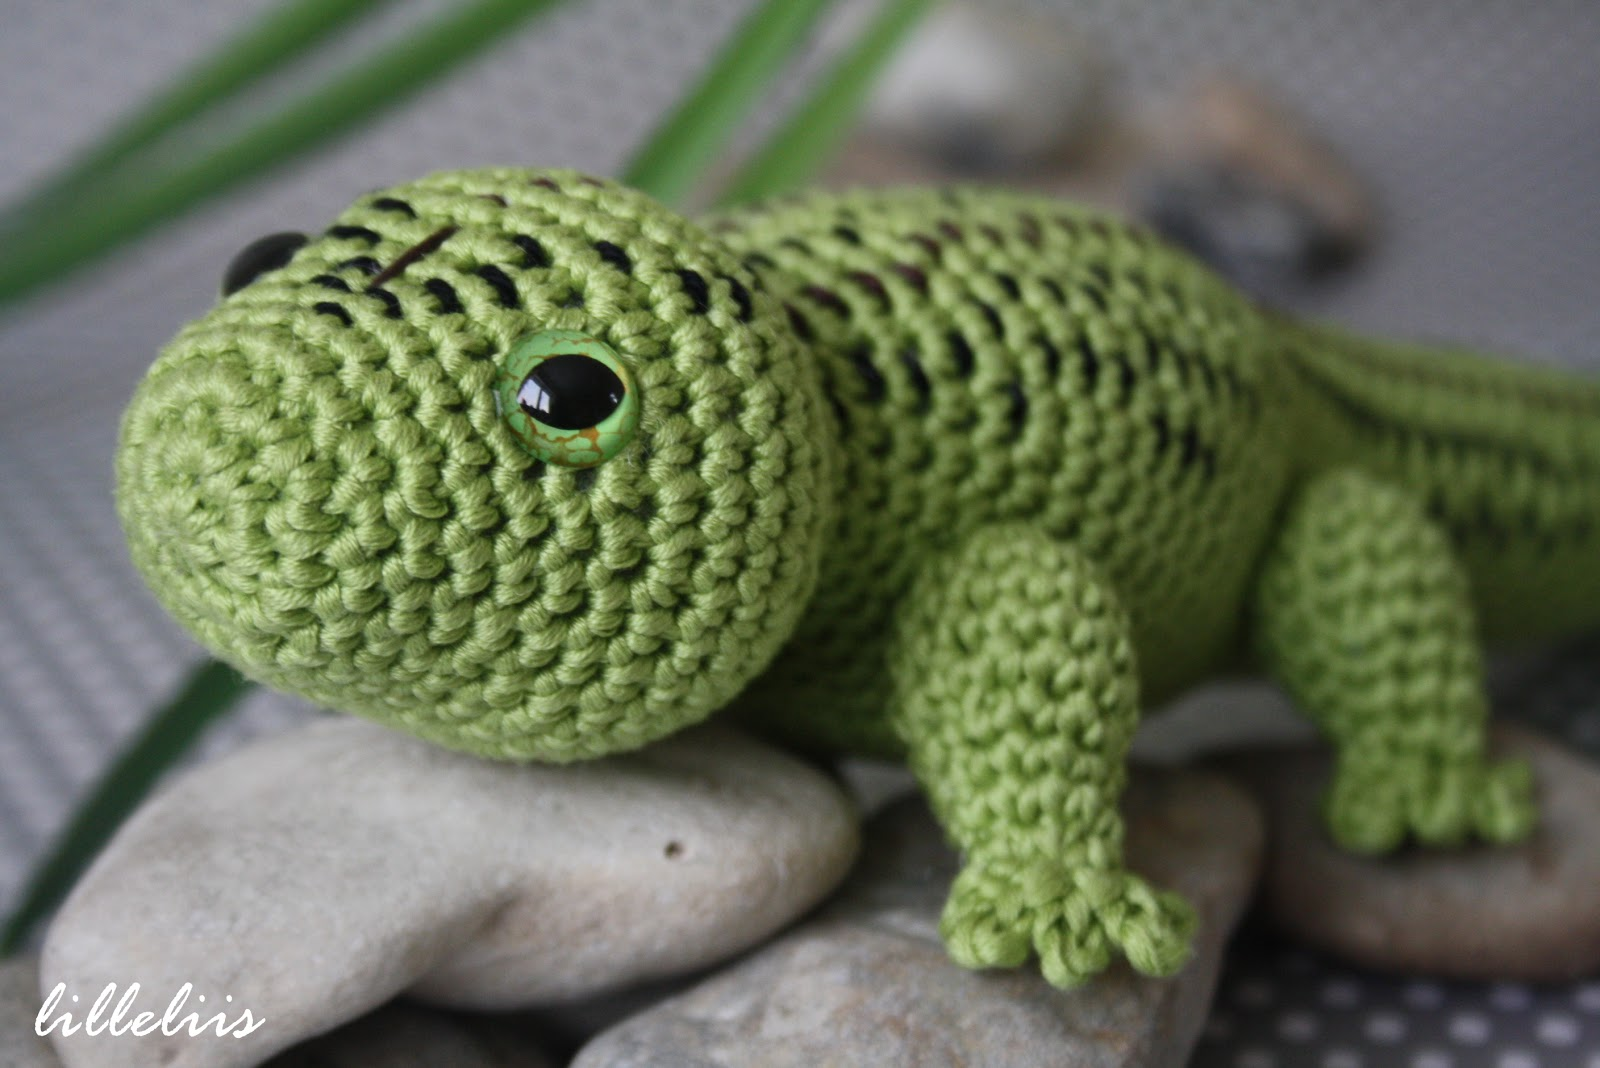 T Rex Amigurumi Pattern Free : lilleliis.blogspot.com: Amigurumi lizard/heegeldatud sisalik